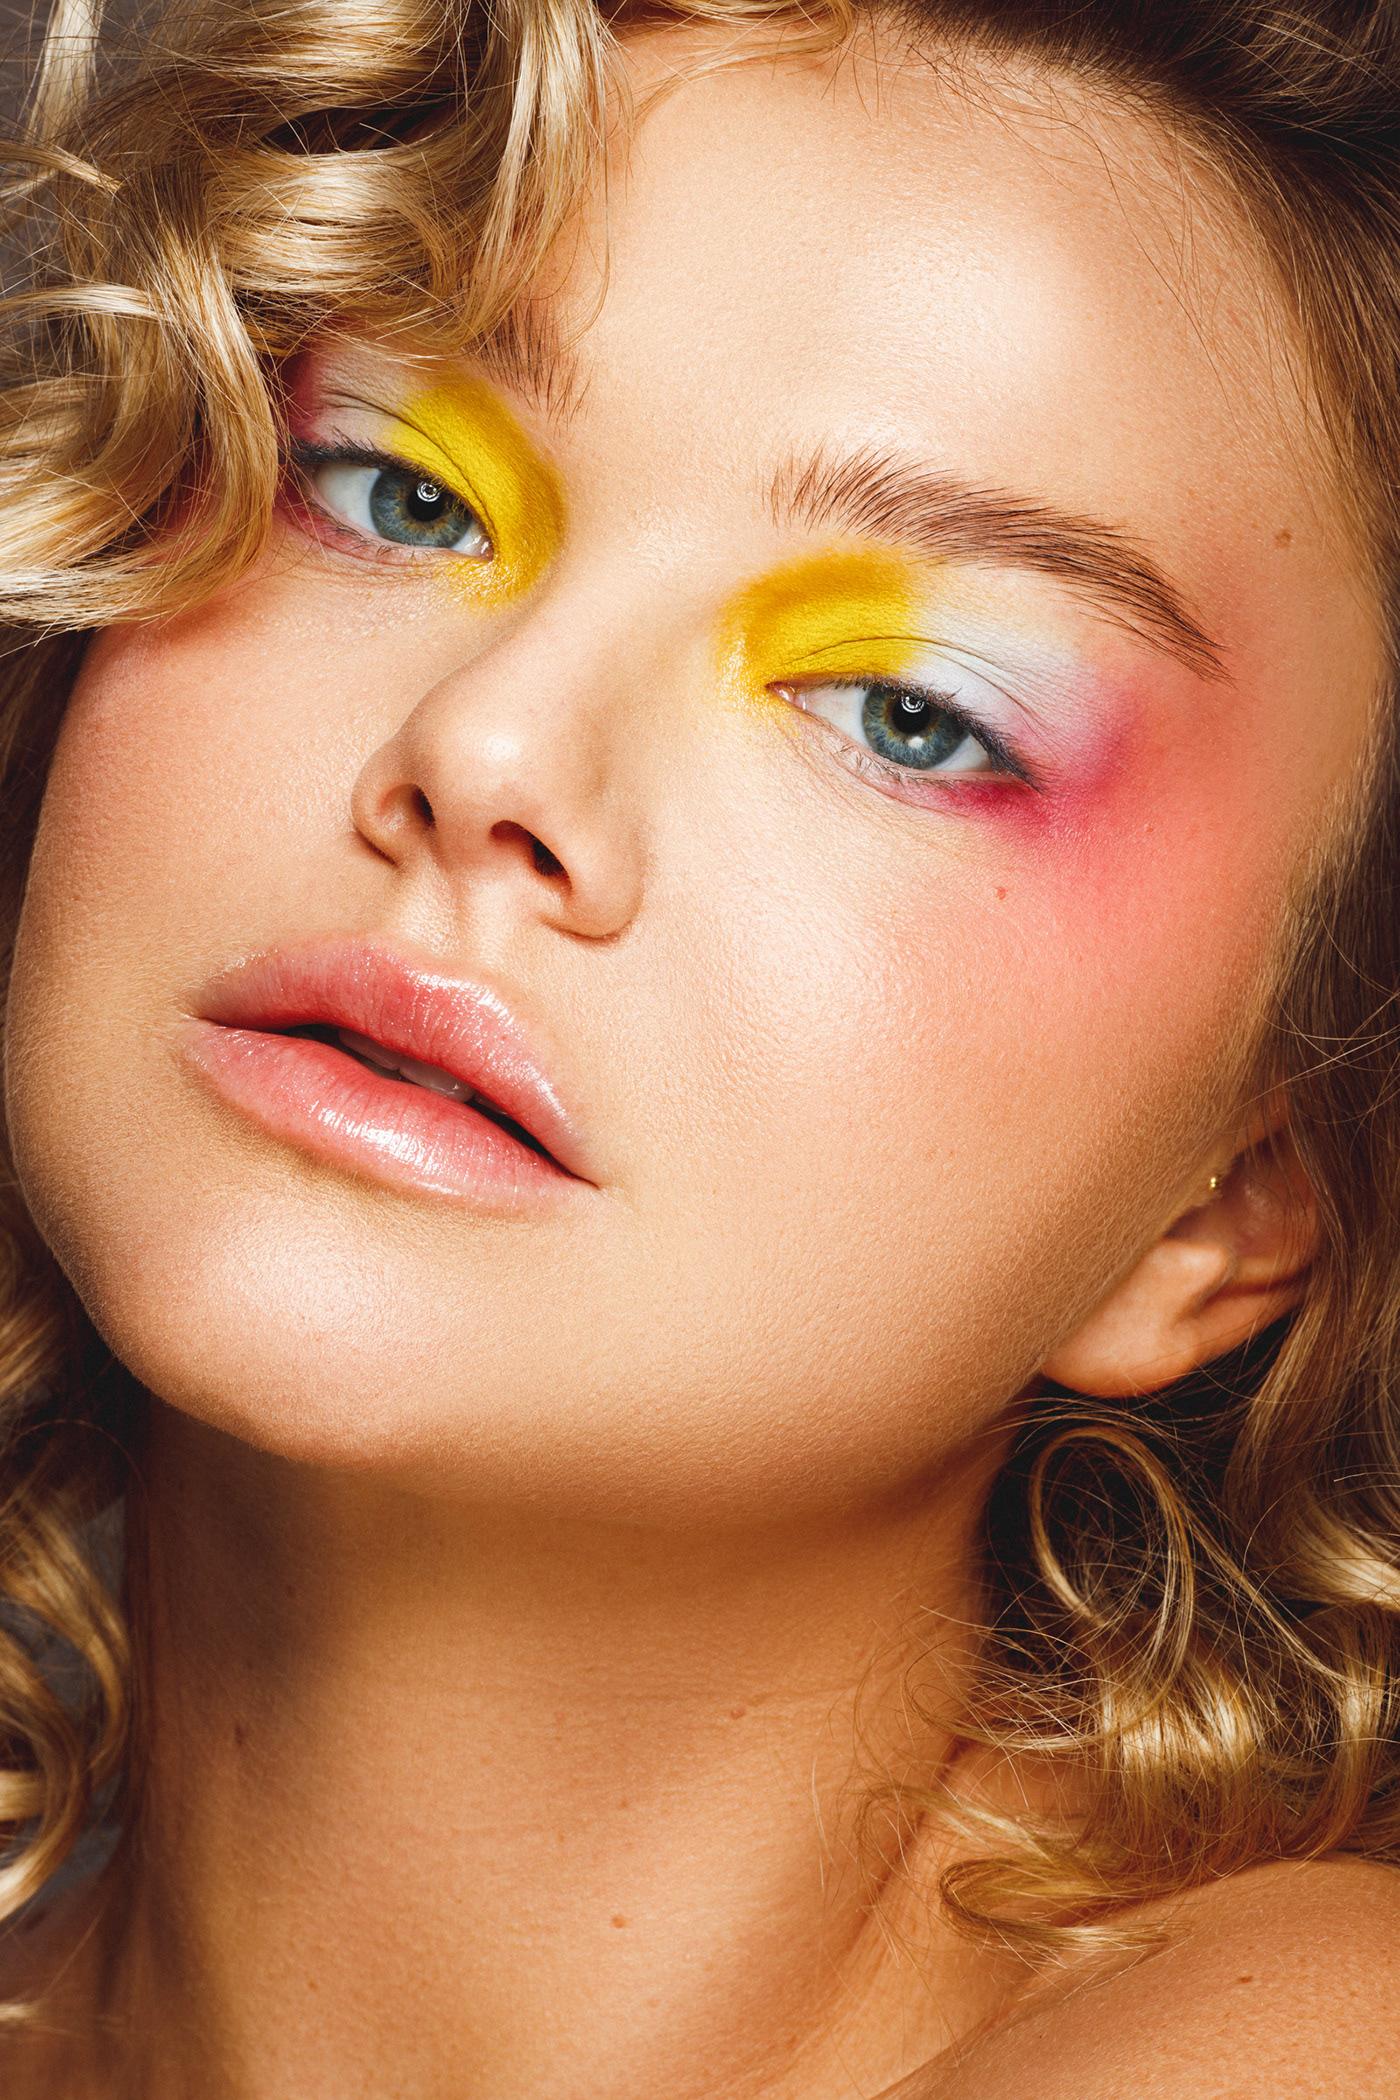 beauty editorial Fashion  Magazine Cover Mode Montreal montreal photo Photography  portrait studio